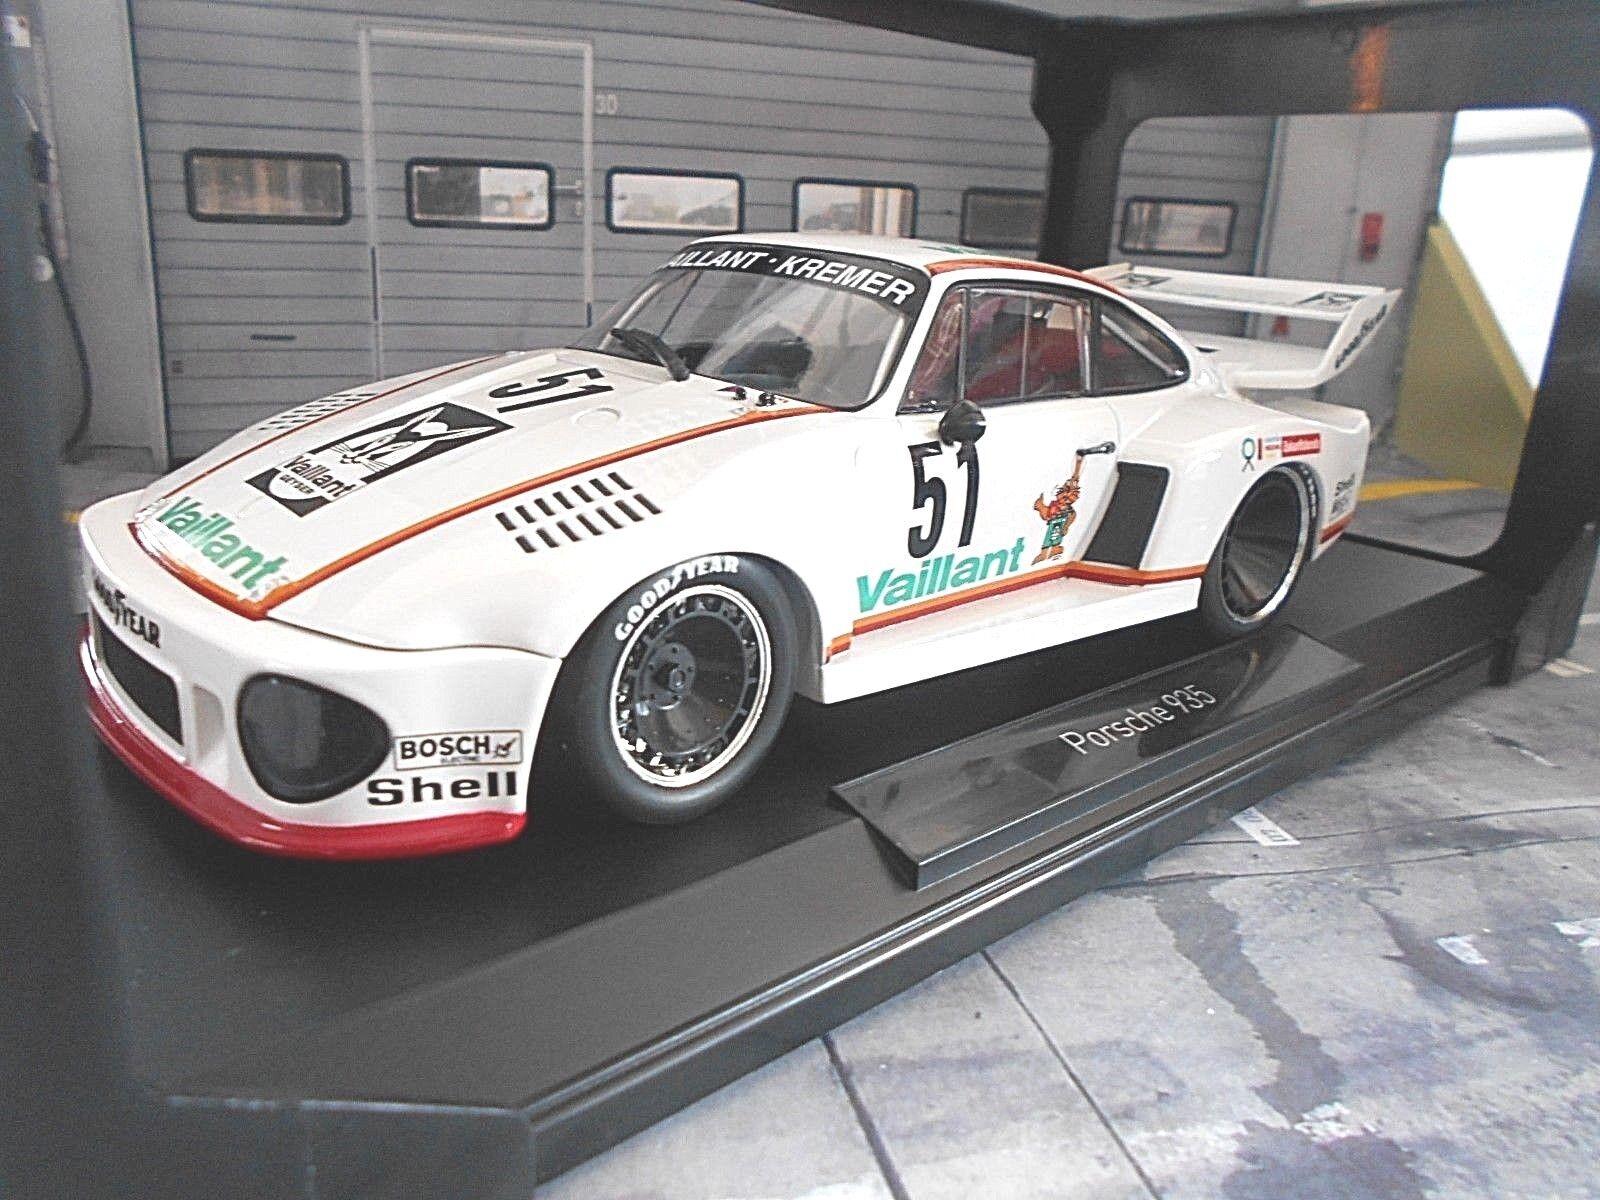 PORSCHE 935 Turbo Kremer Vaillant Drm 1977 Zolder VAILLANT VAILLANT VAILLANT  51 Wollek NOREV 1 18 3a994d